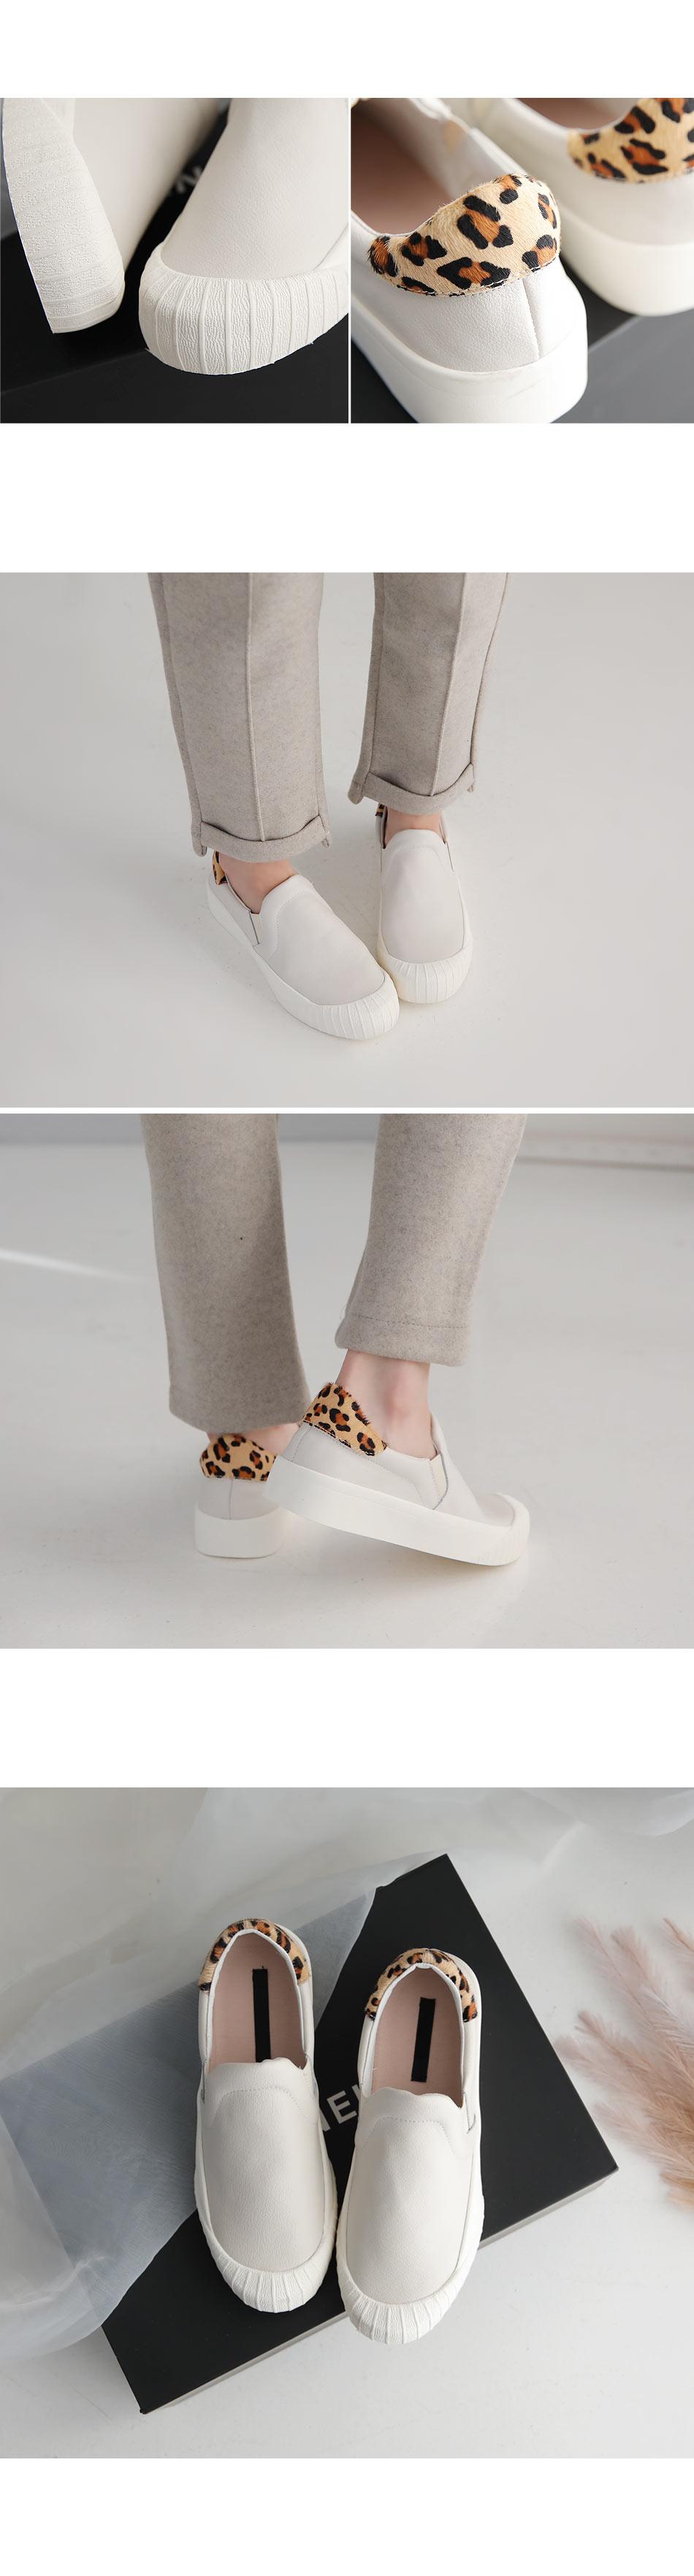 Pantia Slip-on 3cm